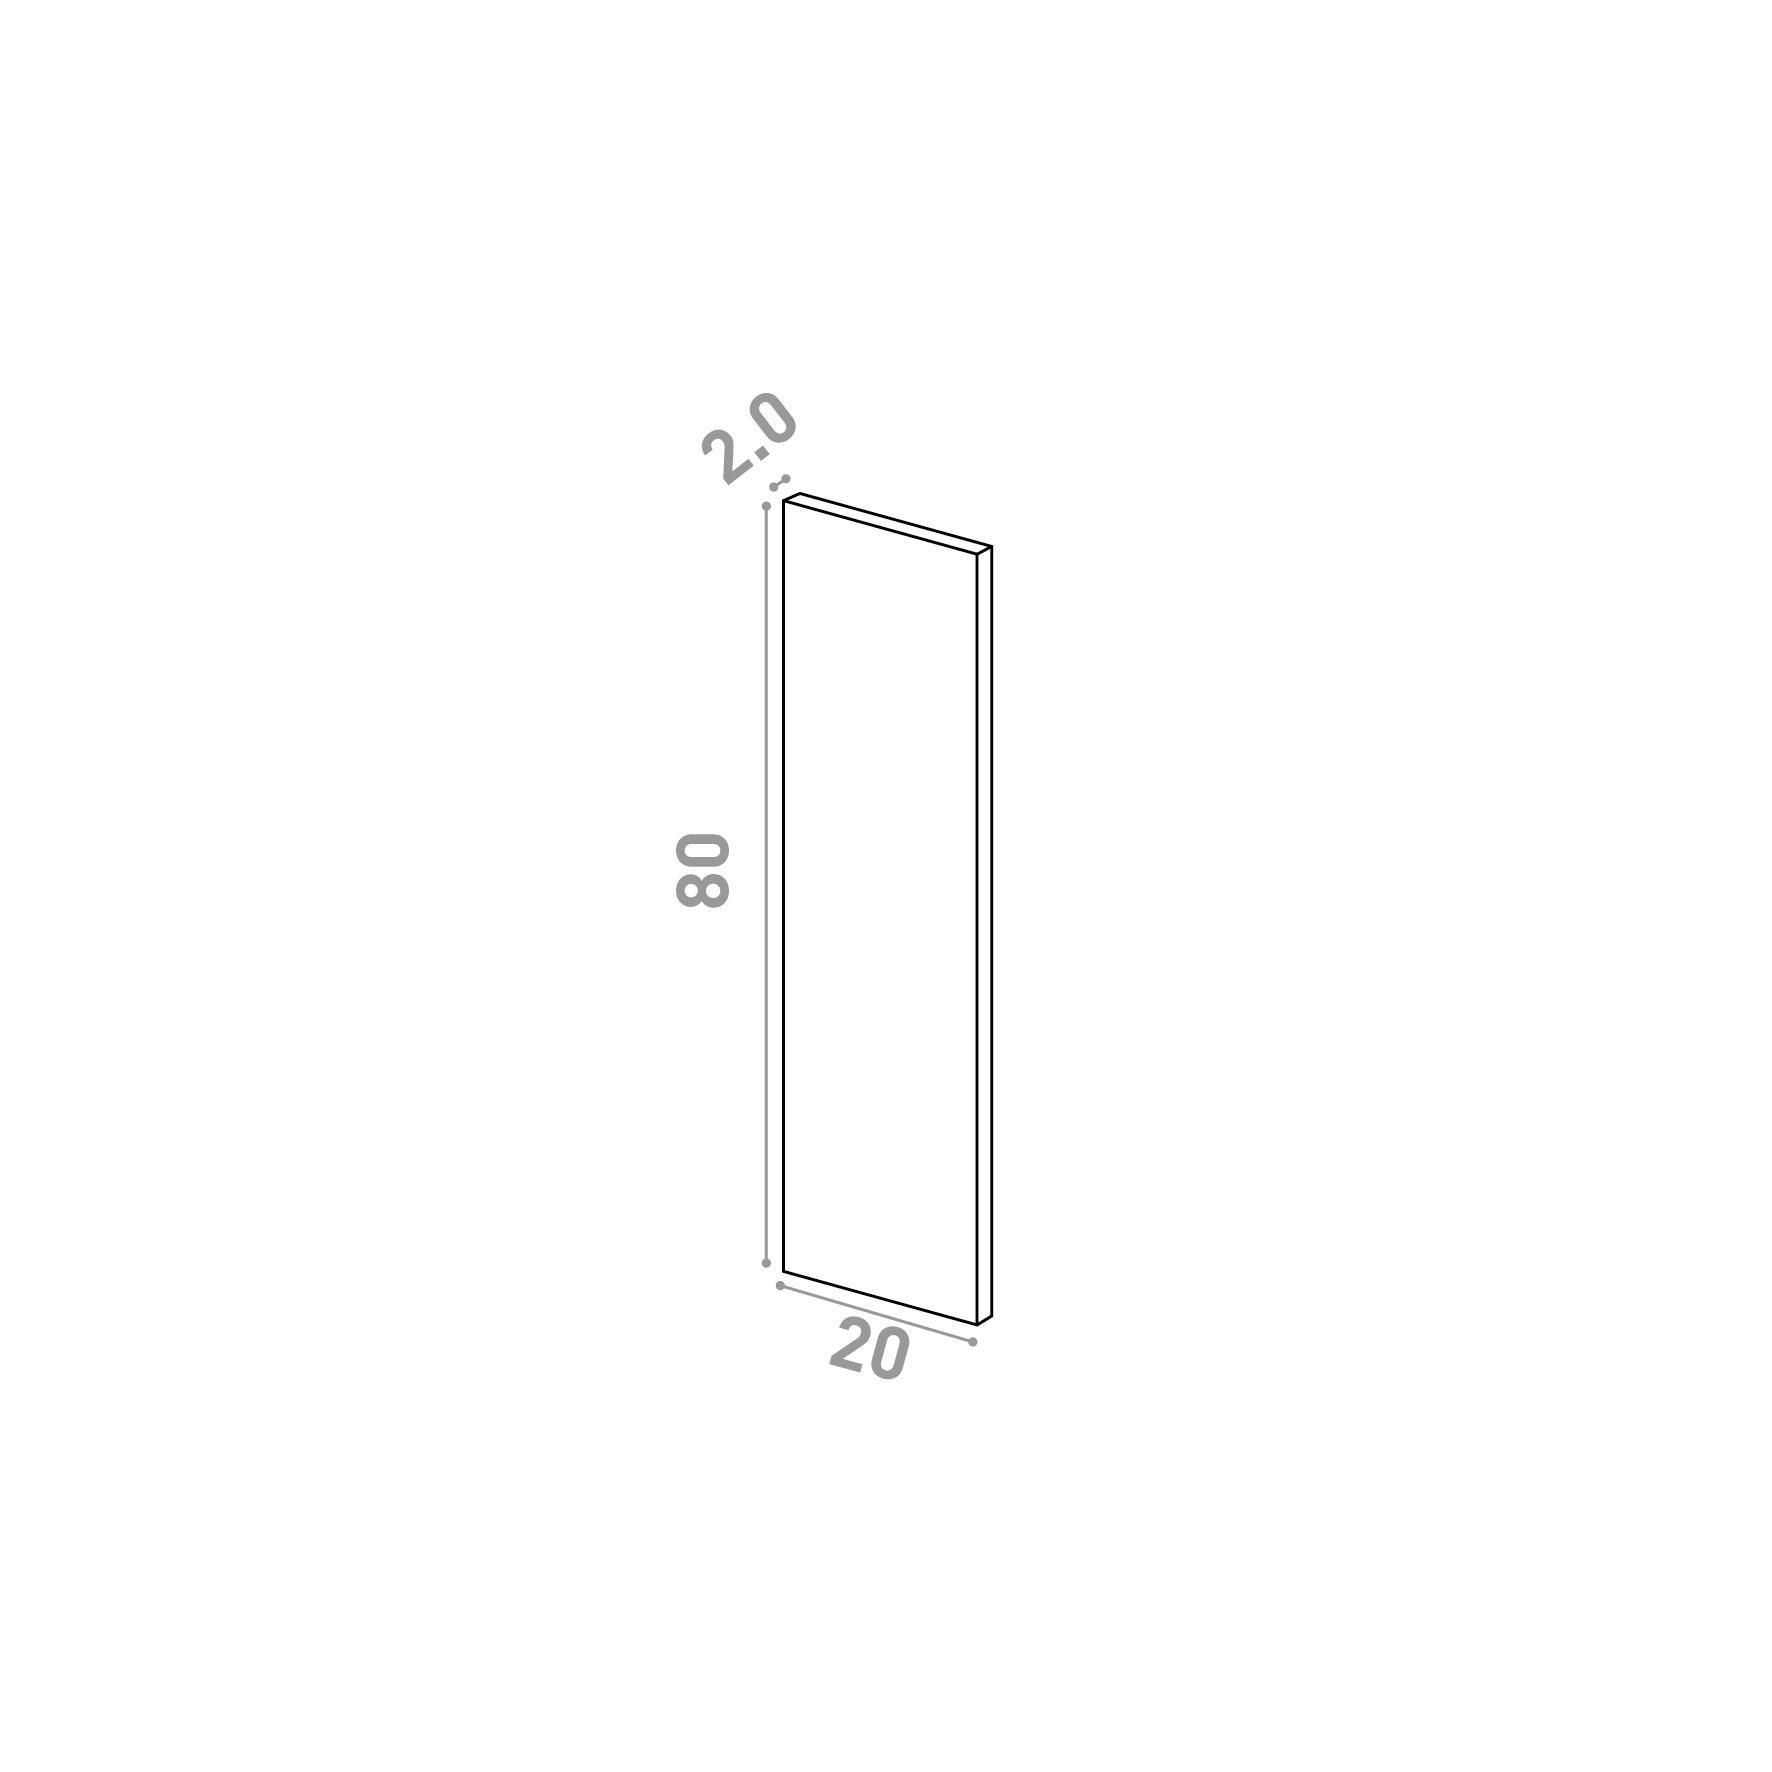 Porte 20X80cm   design lisse   chêne naturel